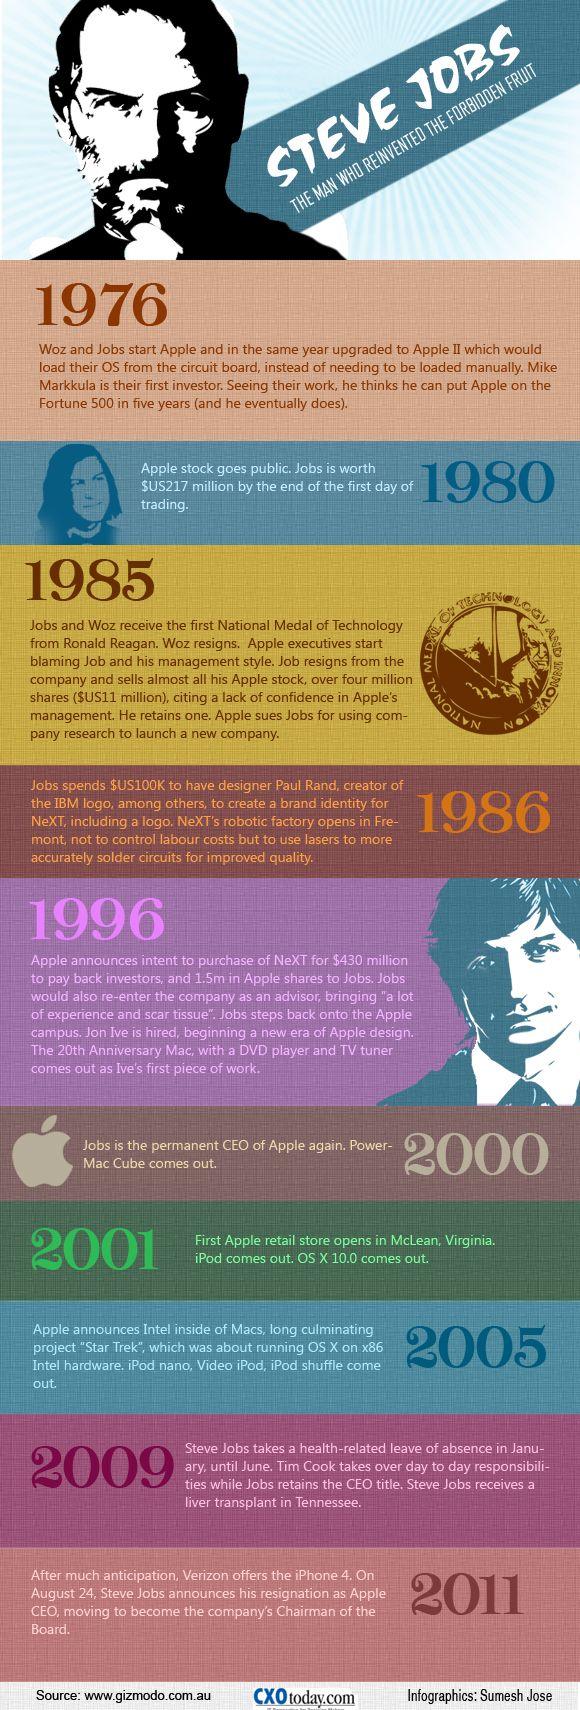 Steve Jobs Resigns as Apple CEO - CXOtoday.com  #stevejobs #stevejobsquotes #kurttasche